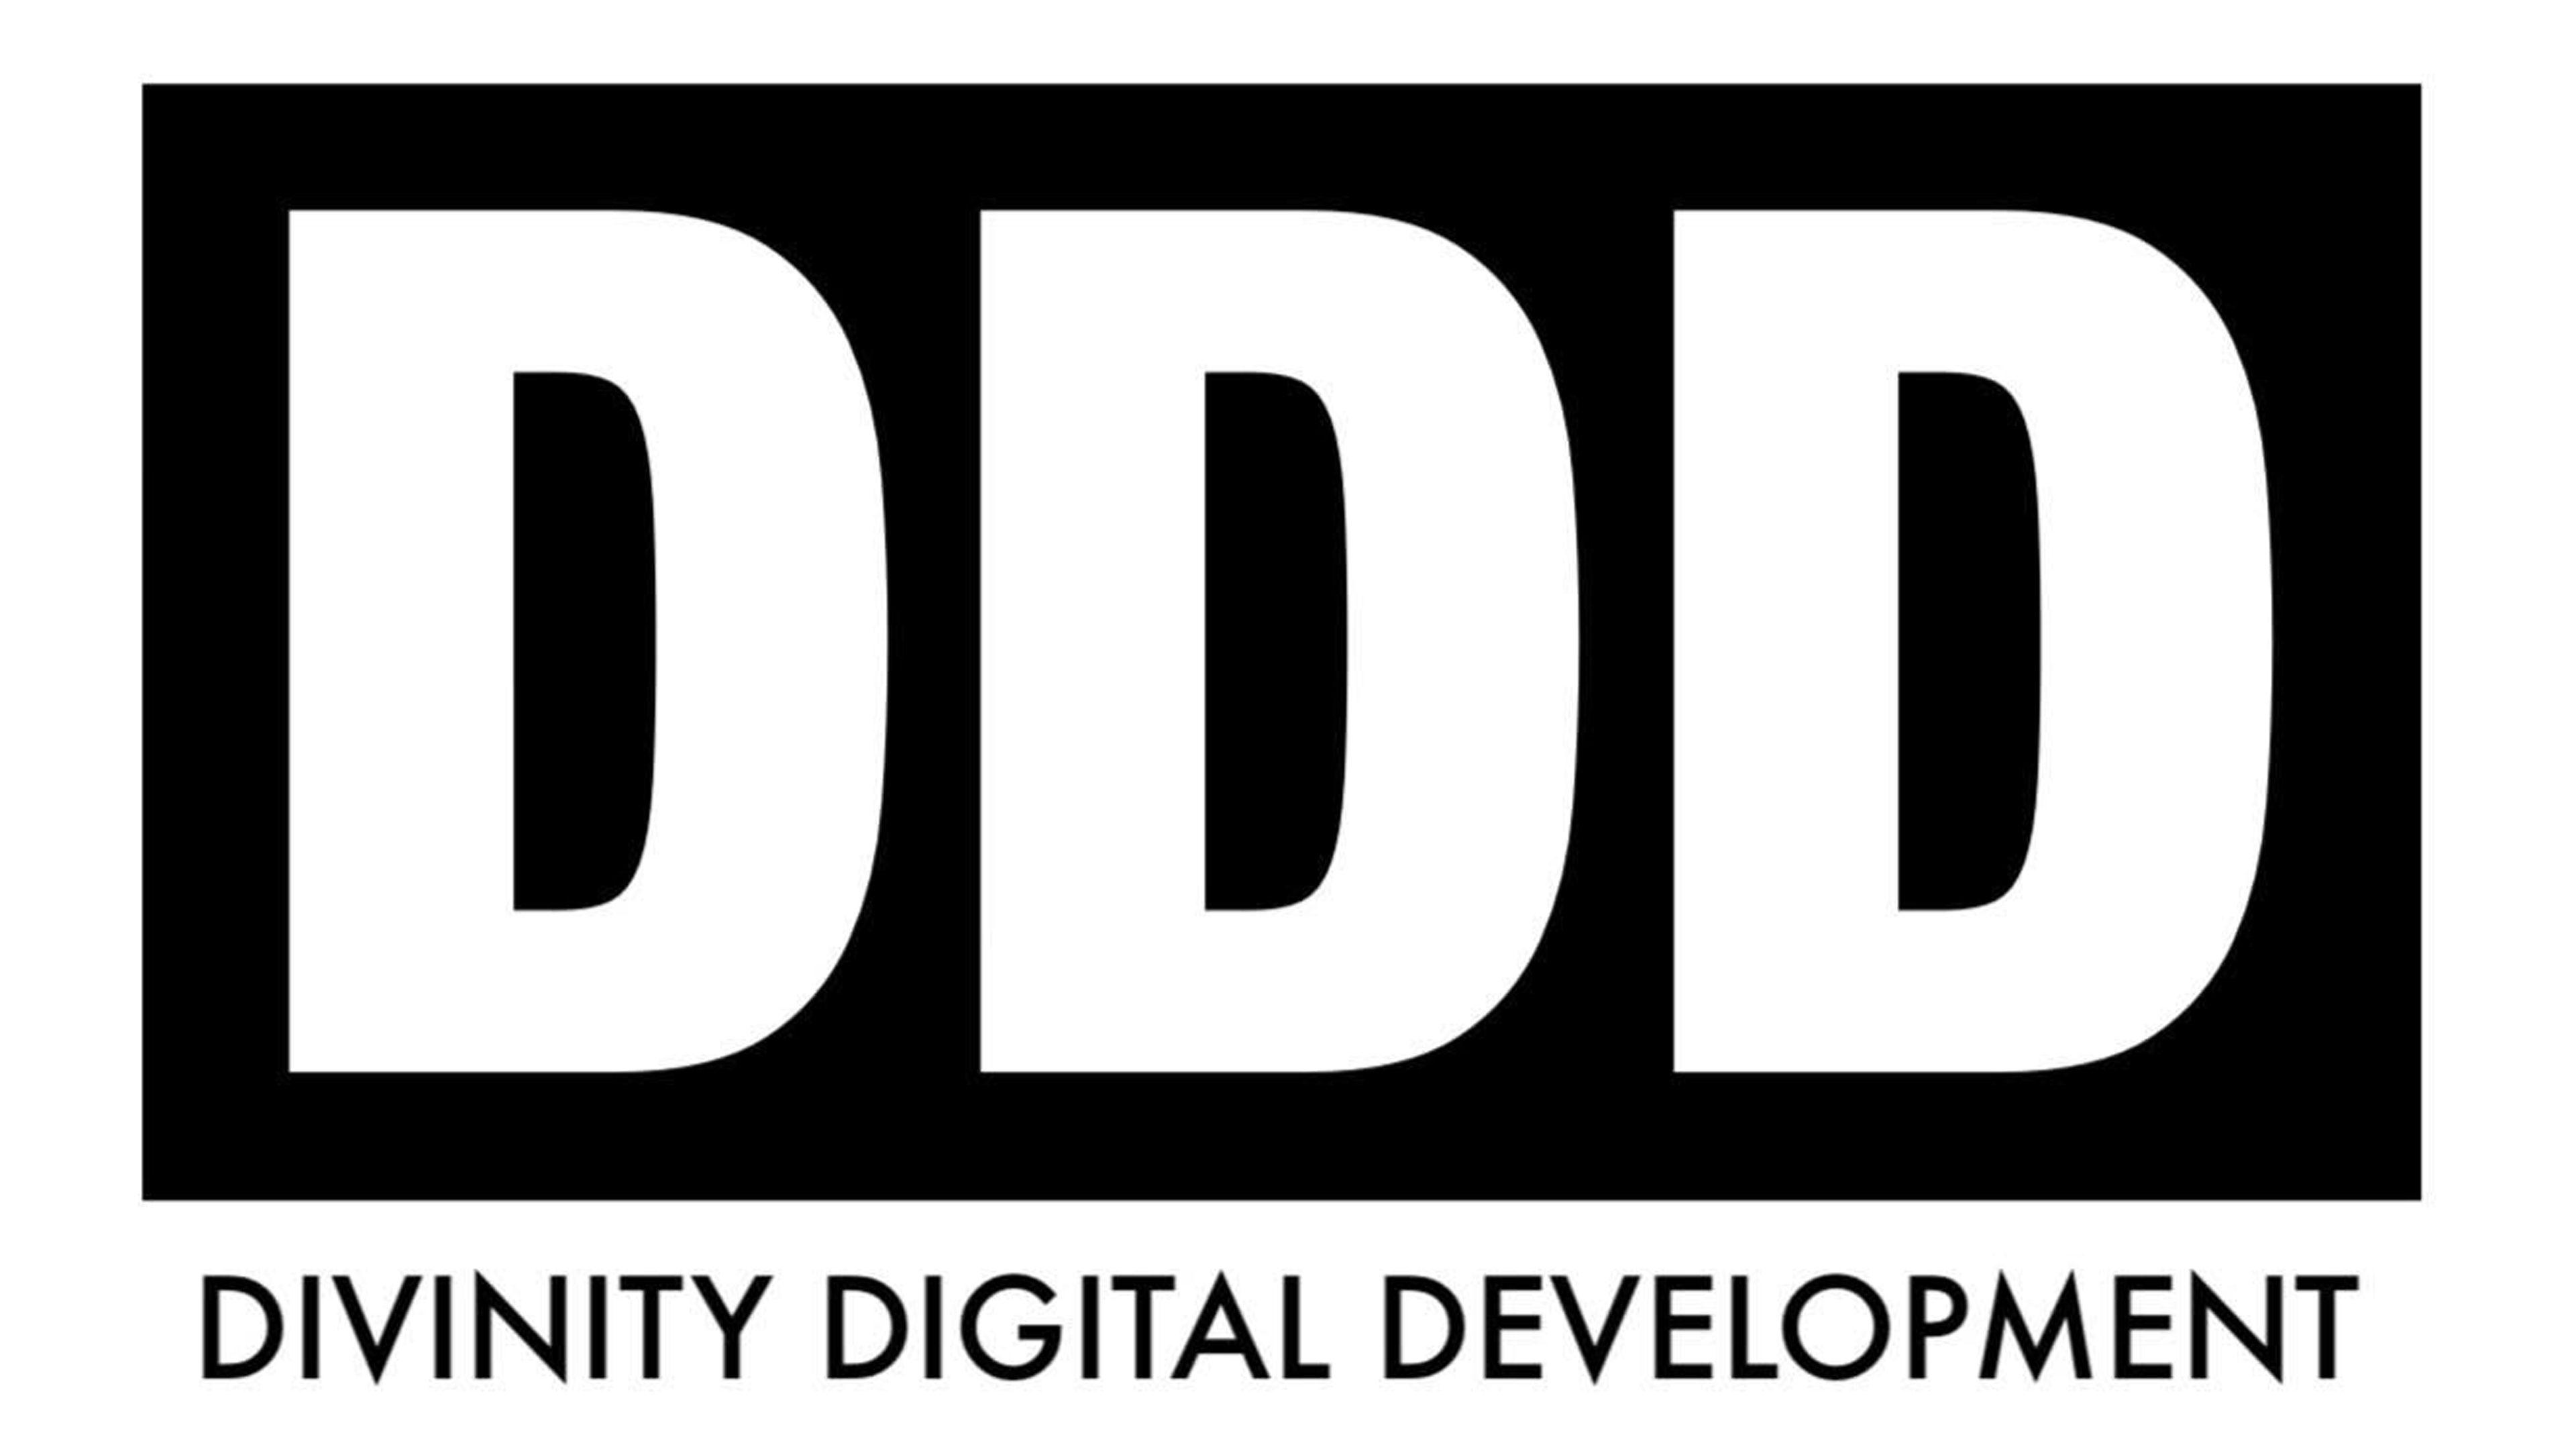 Divinity Digital Development